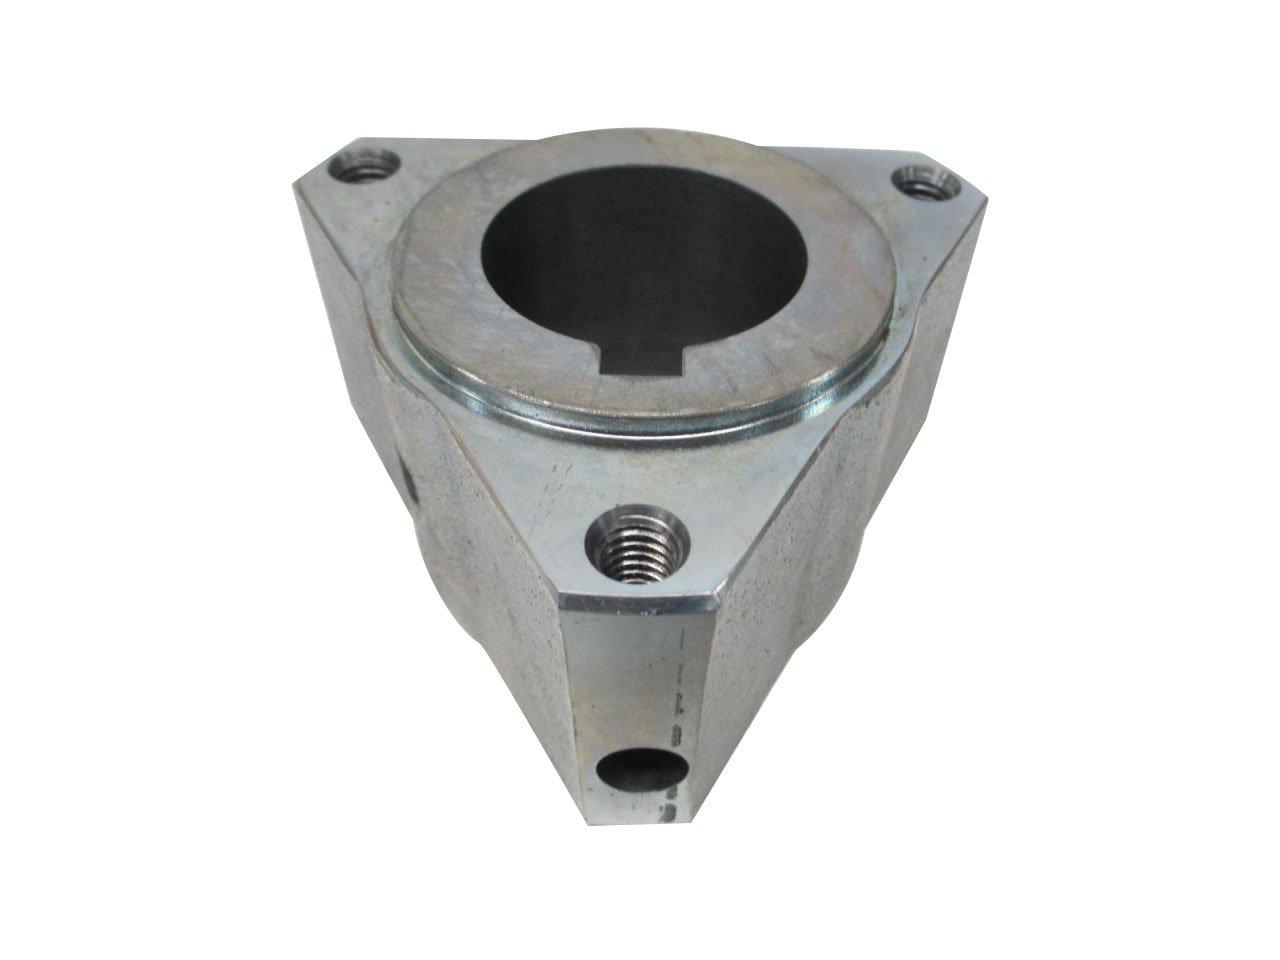 7.25 OD 3.88 Length through Bore Lovejoy 68514439222 Ductile Iron//Zinc 100 Delta Hub 7//8 x 7//16 Keyway 3-3//4 Bore 3.88 Length through Bore 7.25 OD 7//8 x 7//16 Keyway LOV   100 DELTA 3-3//4 HUB KEYWAY 3-3//4 Bore